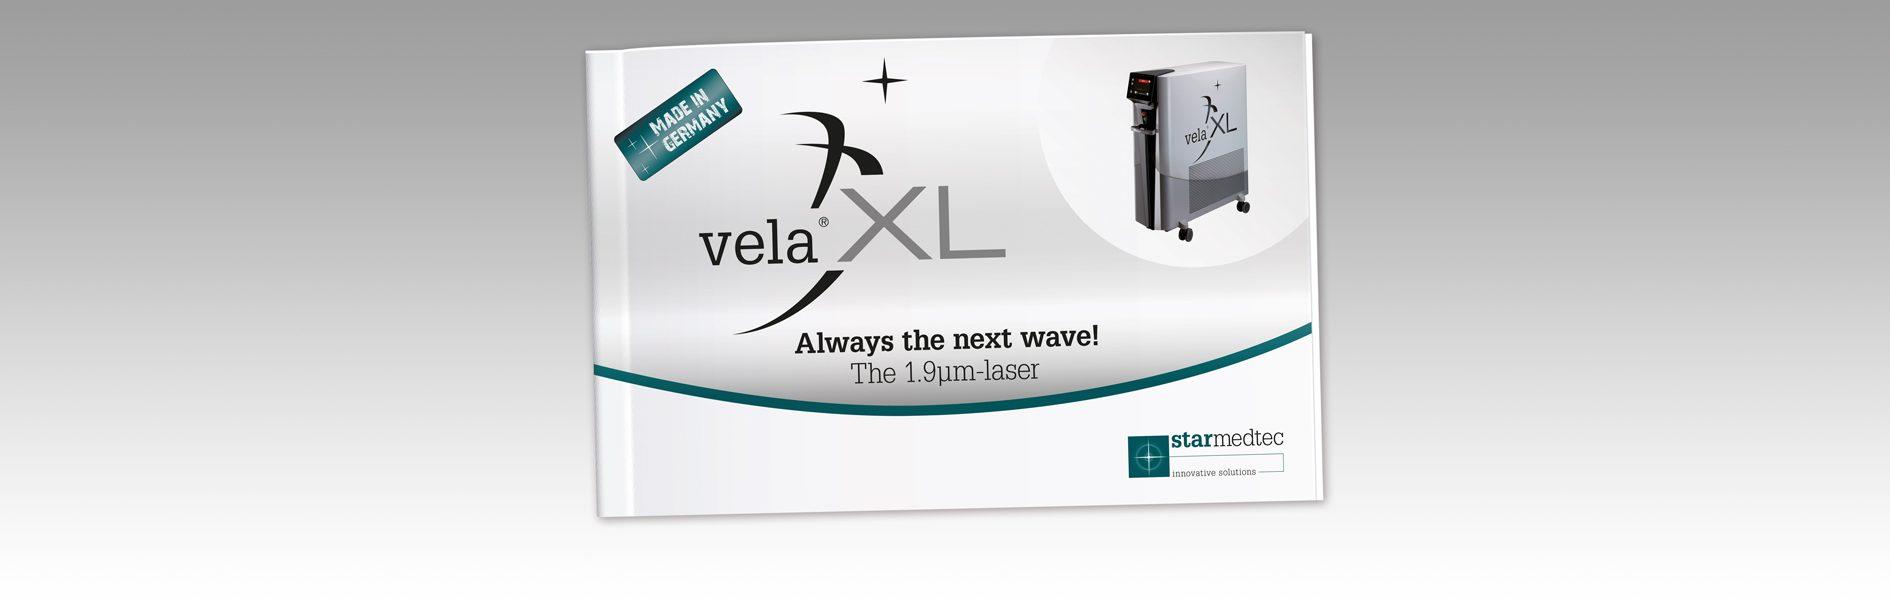 Hier ist das Cover der StarMedTec Produktbroschüre Vela XL abgebildet.